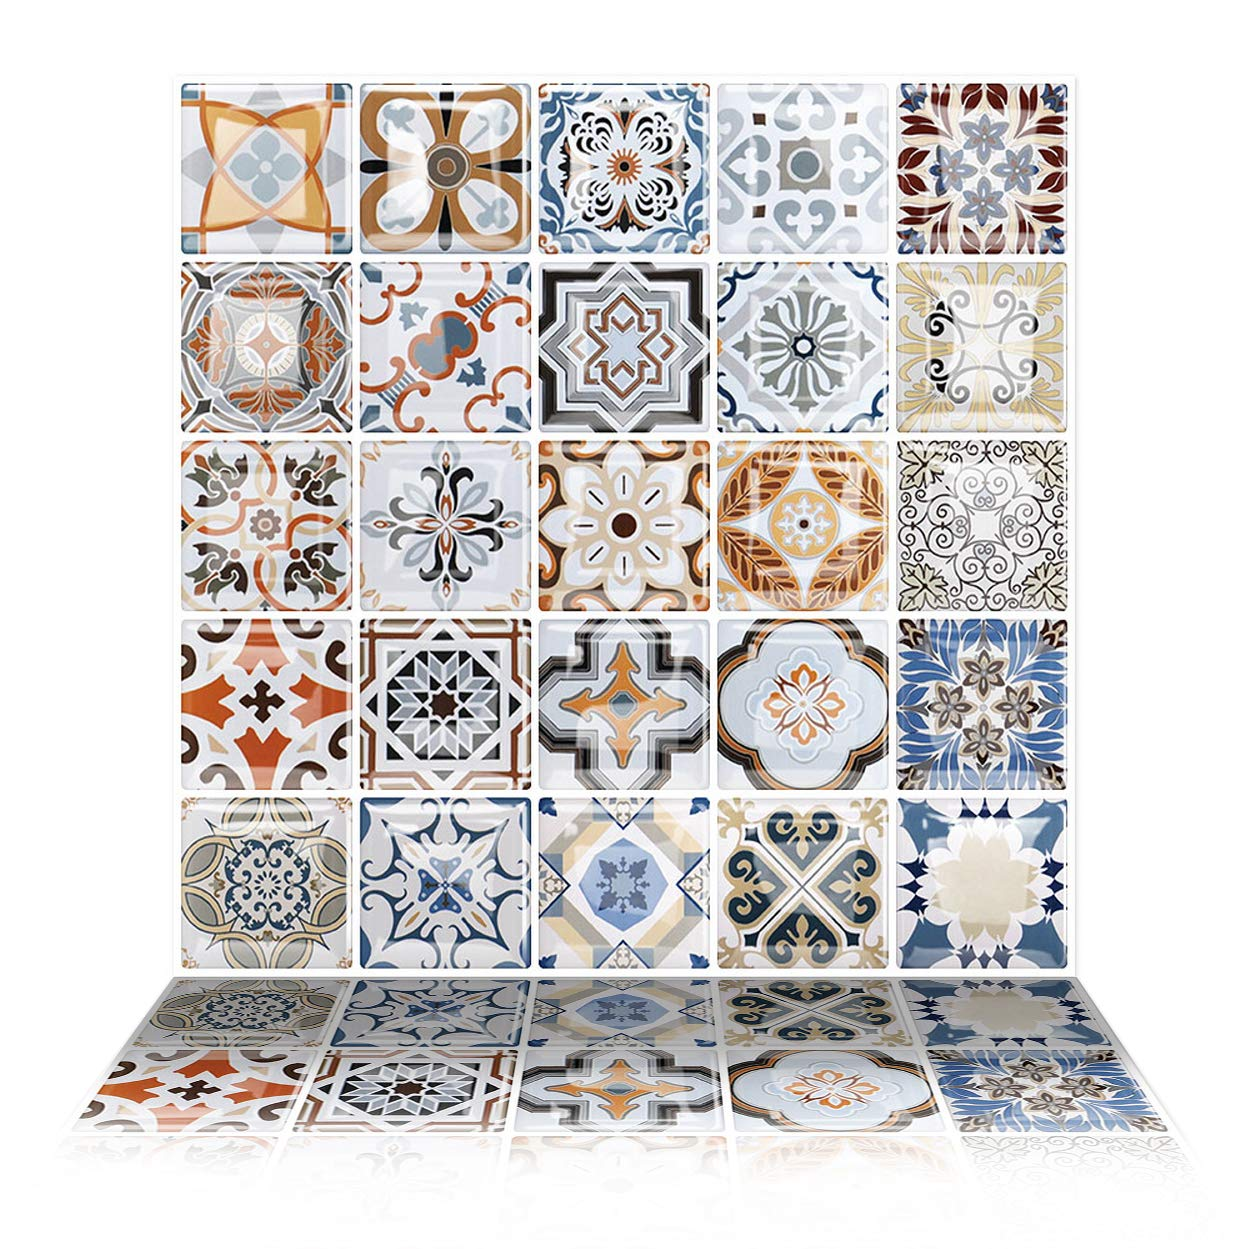 Tic Tac Tiles - Premium Anti Mold Peel and Stick Wall Tile Backsplash in Moroccan Design (Caro, 6)